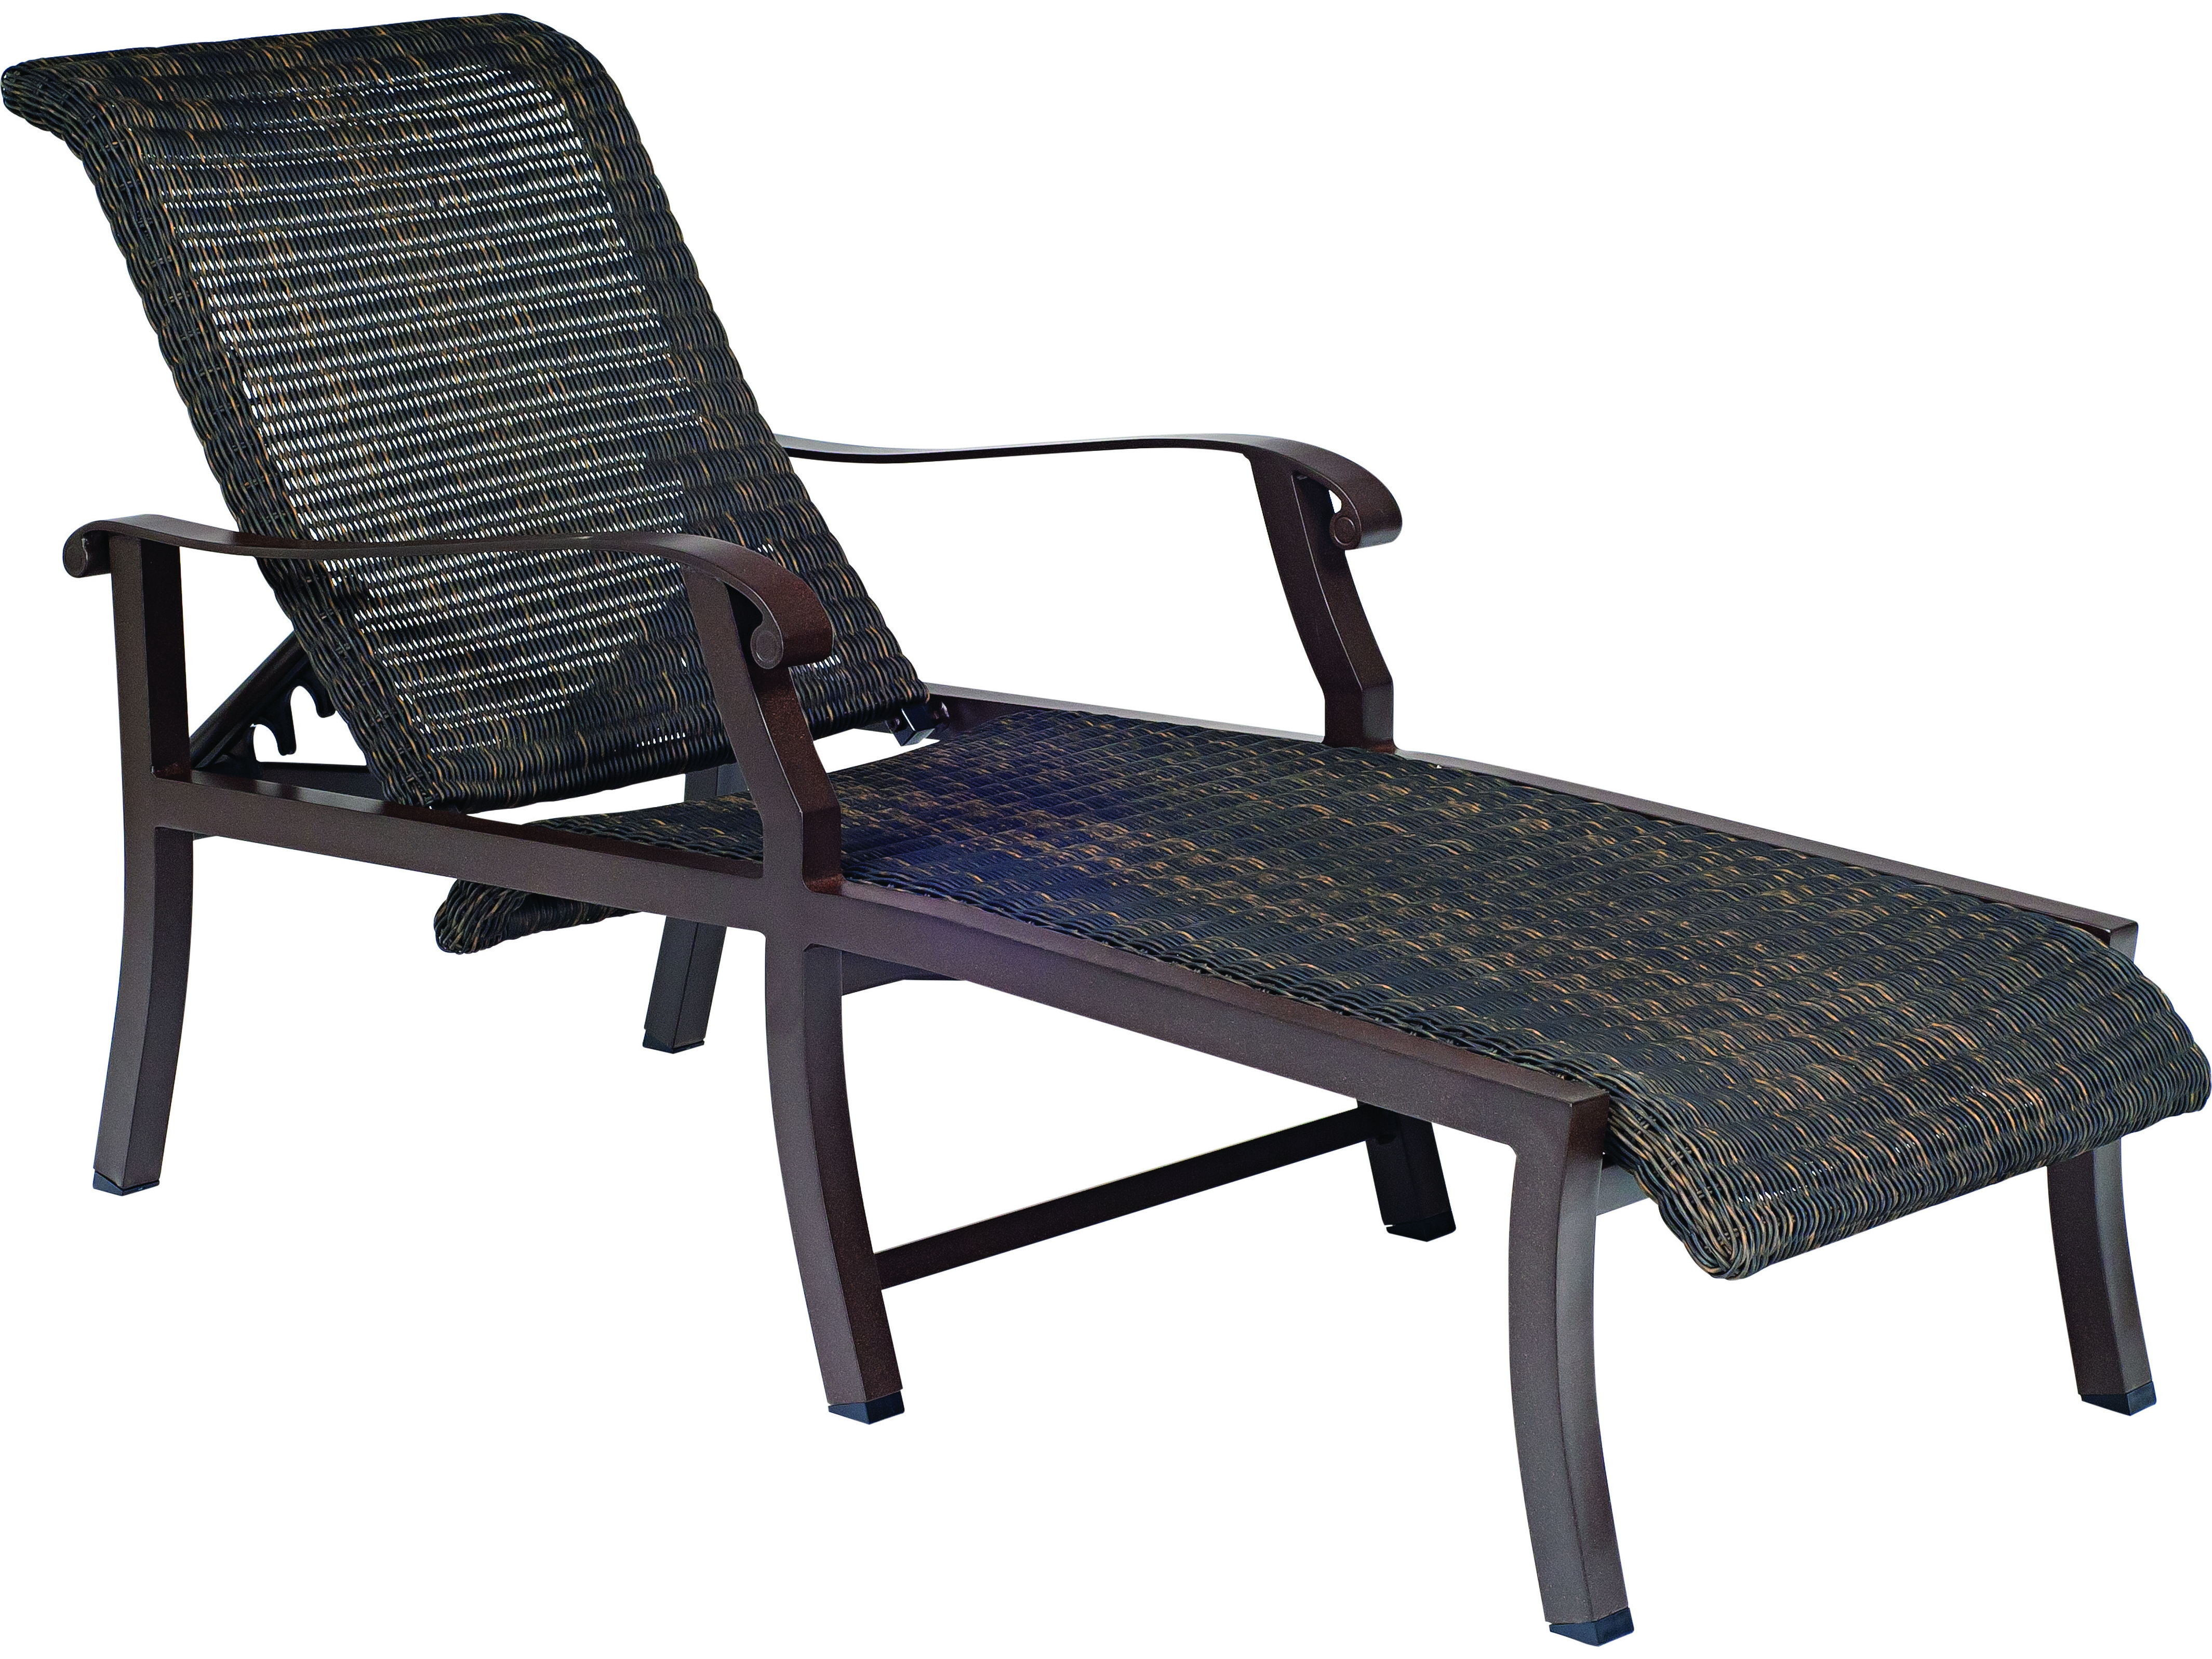 woodard cortland woven round weave wicker adjustable. Black Bedroom Furniture Sets. Home Design Ideas